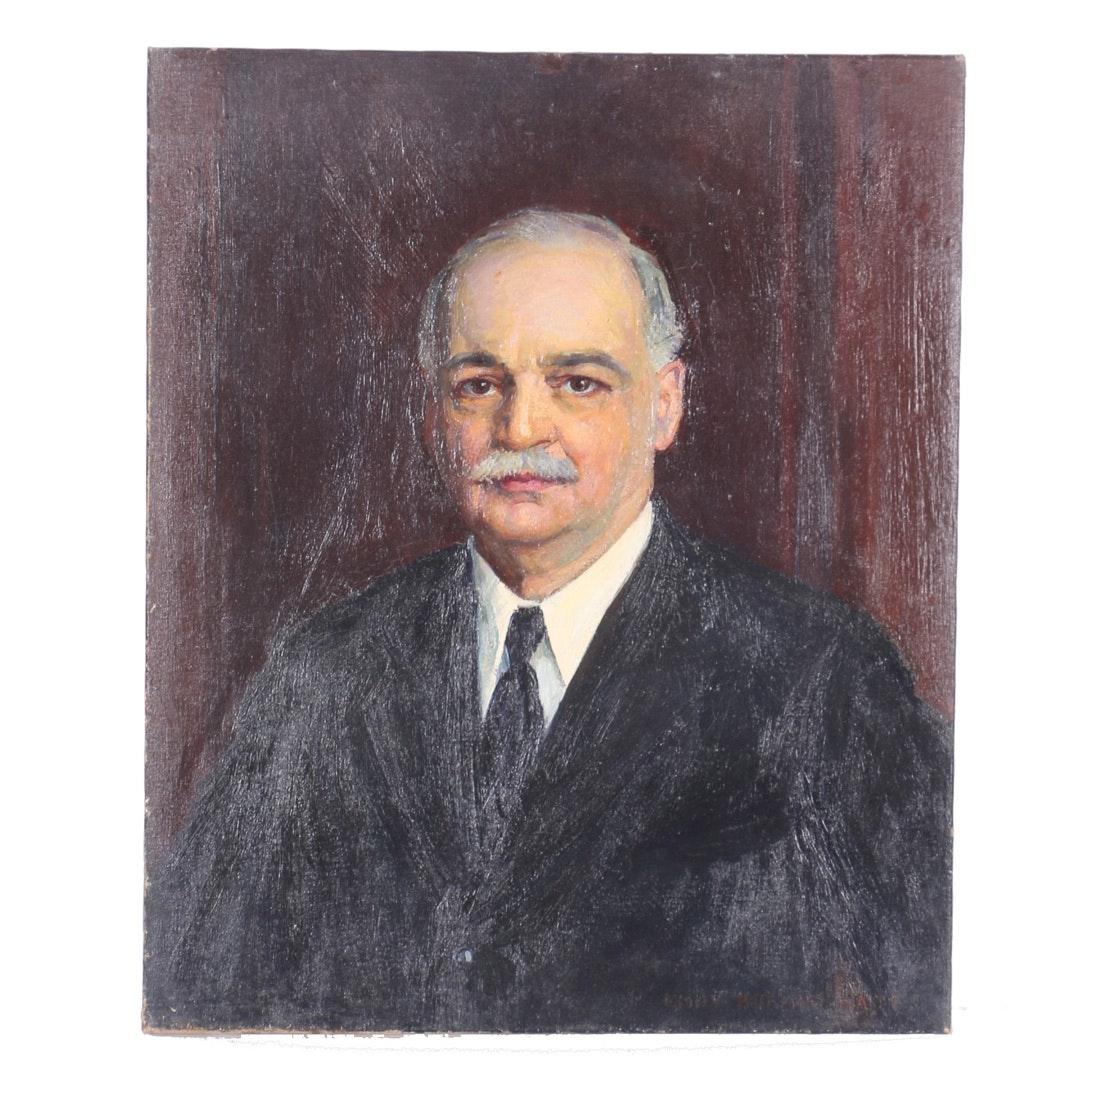 Emily B. Waite Oil on Canvas Portrait of Man